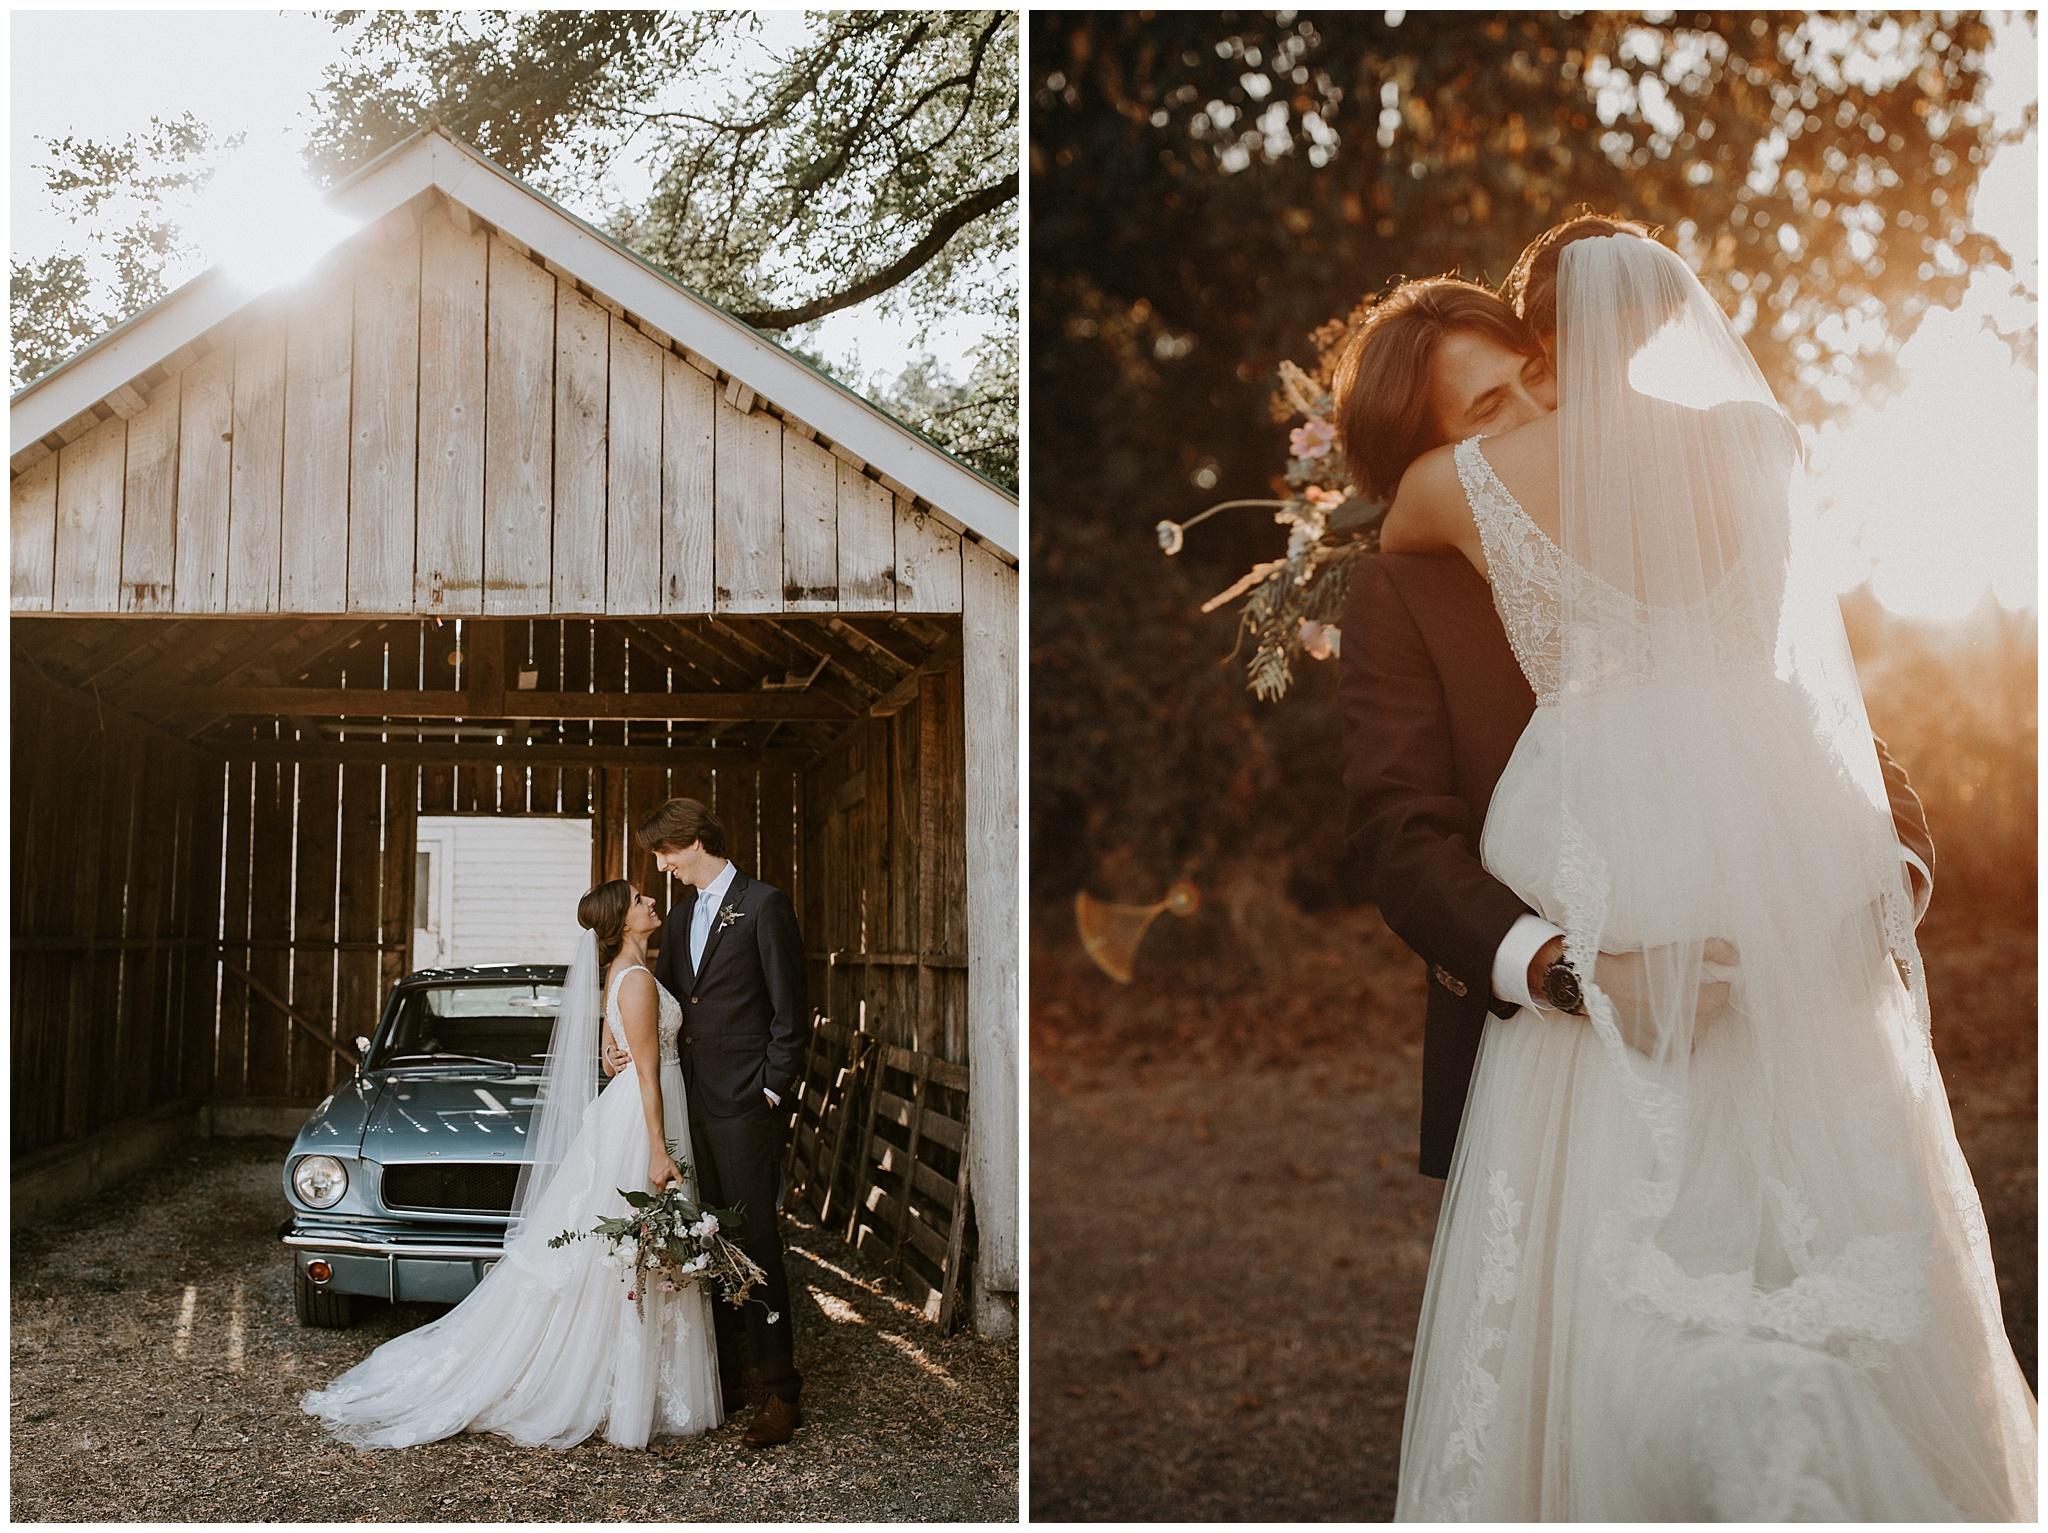 estate-248-wedding-langley-056.JPG